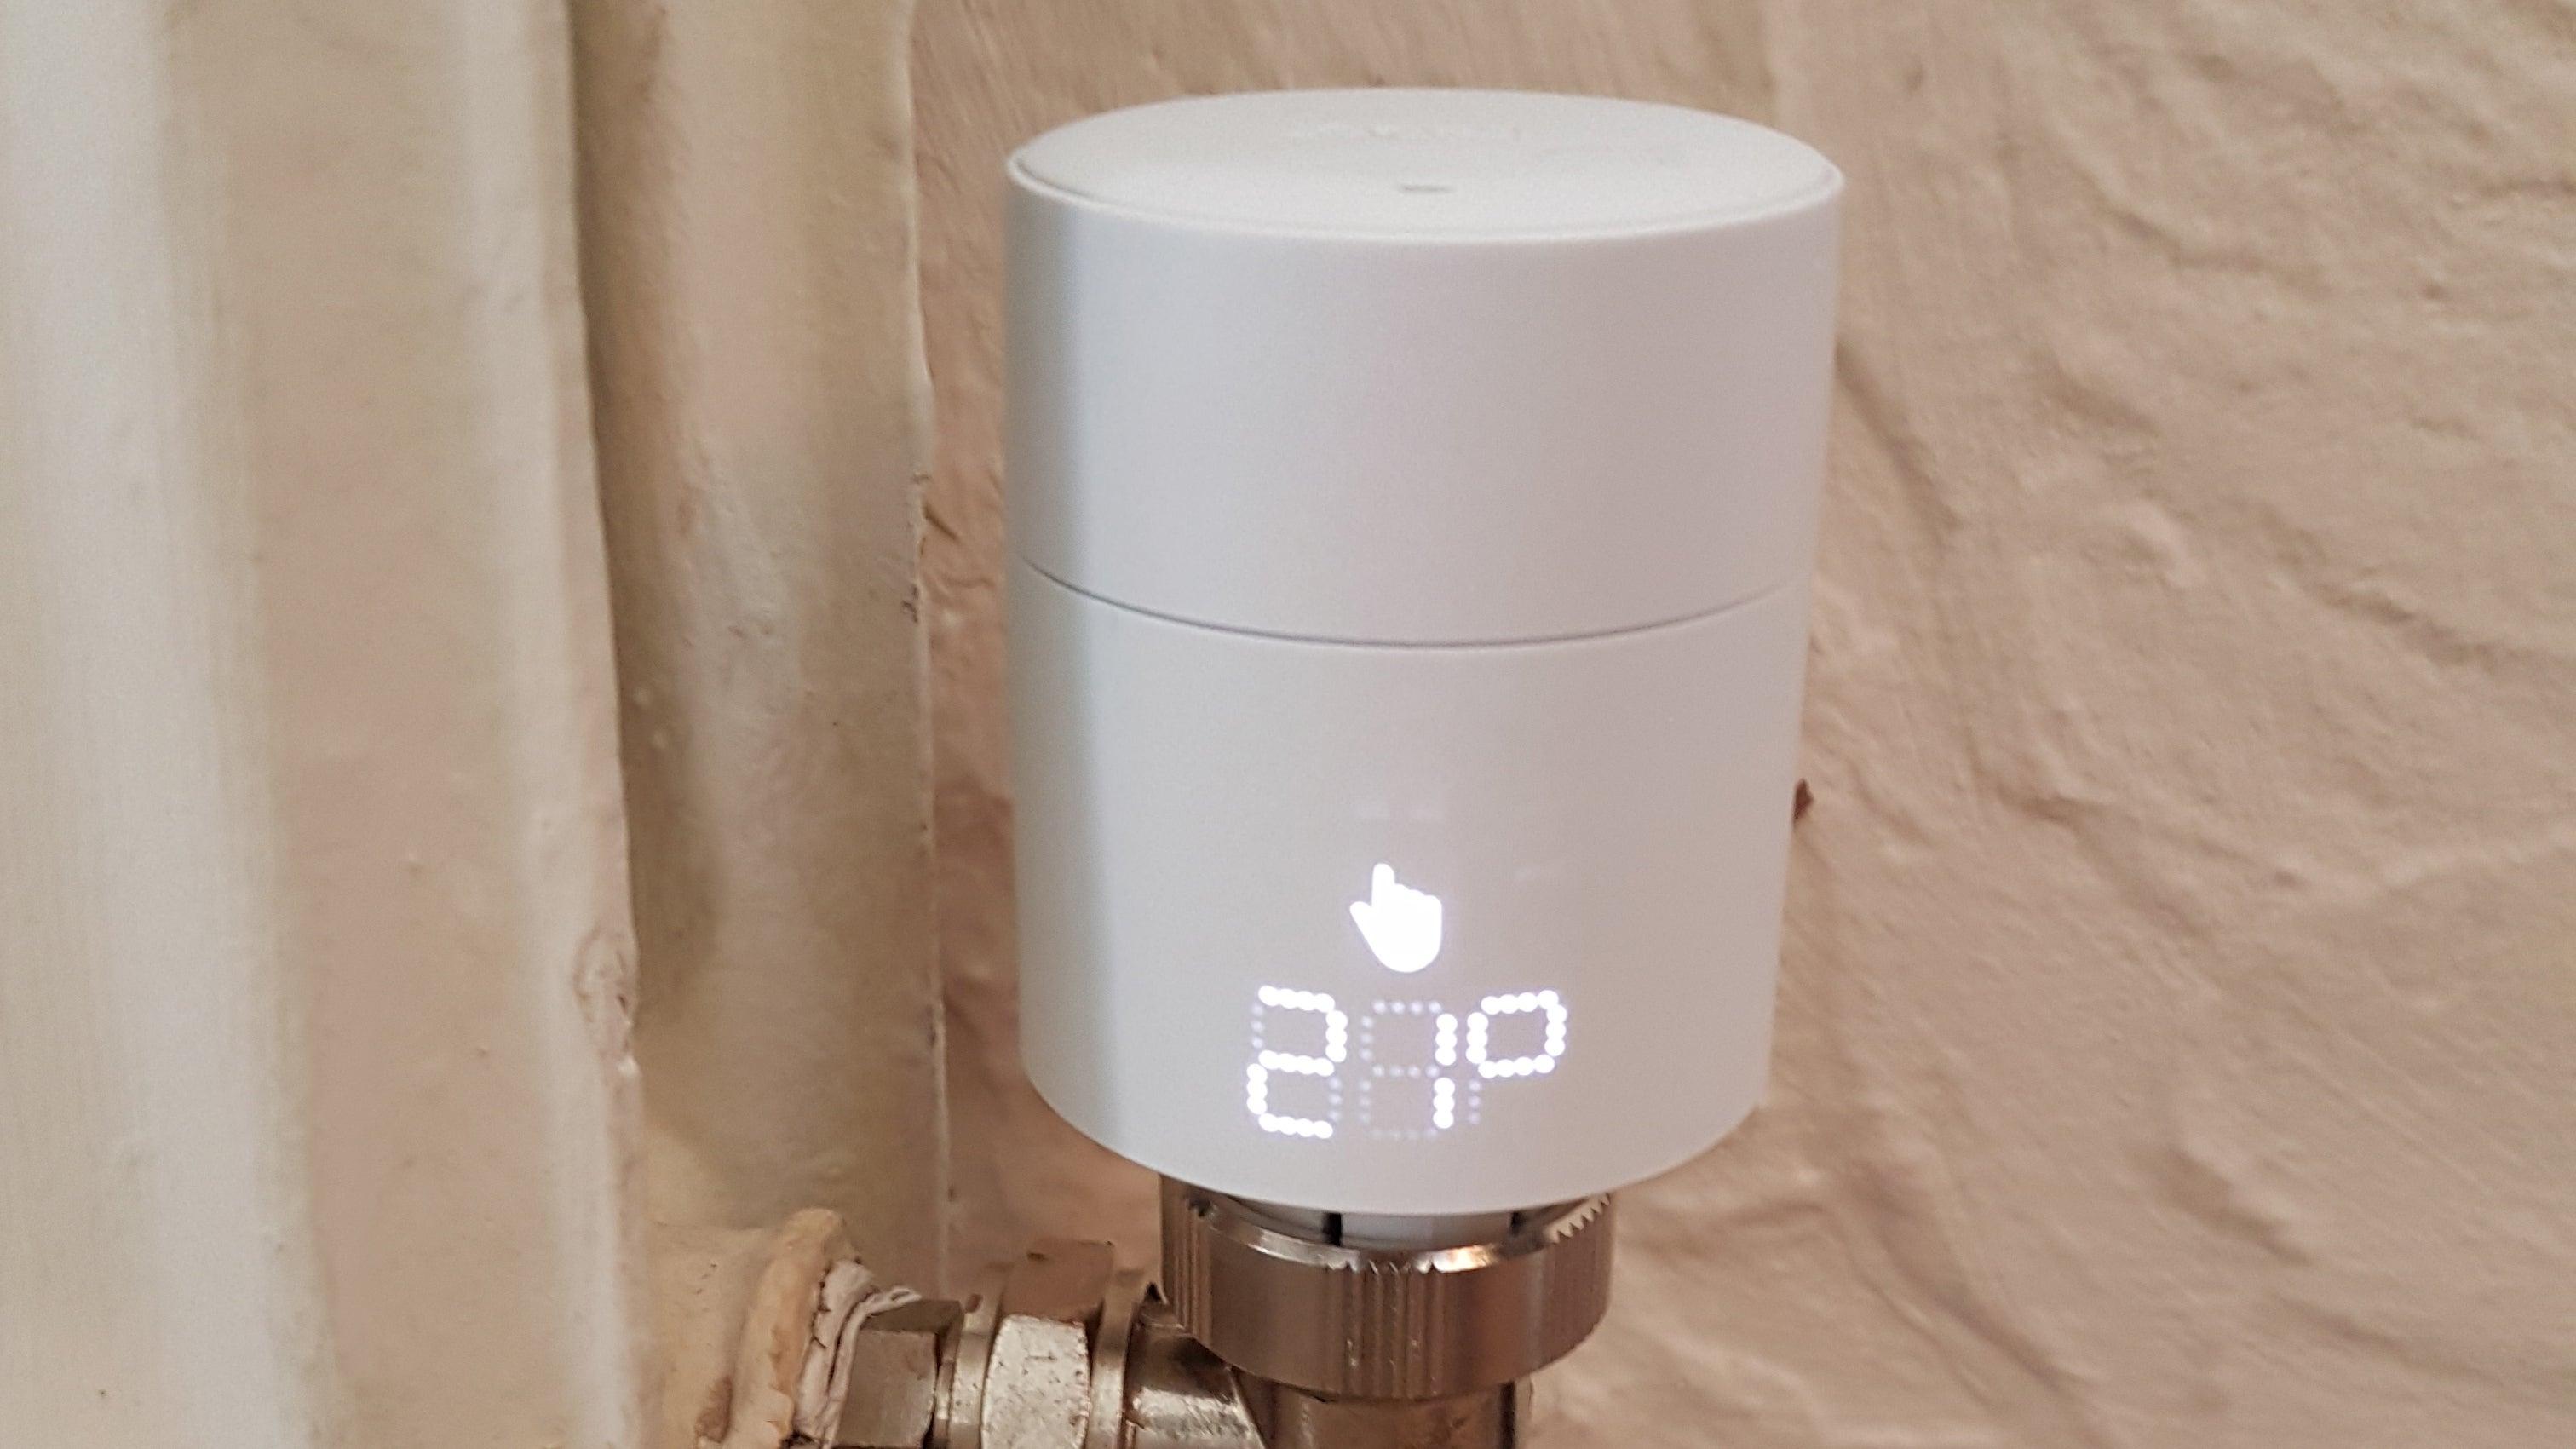 Tado Smart Radiator Thermostat Starter Kit Review